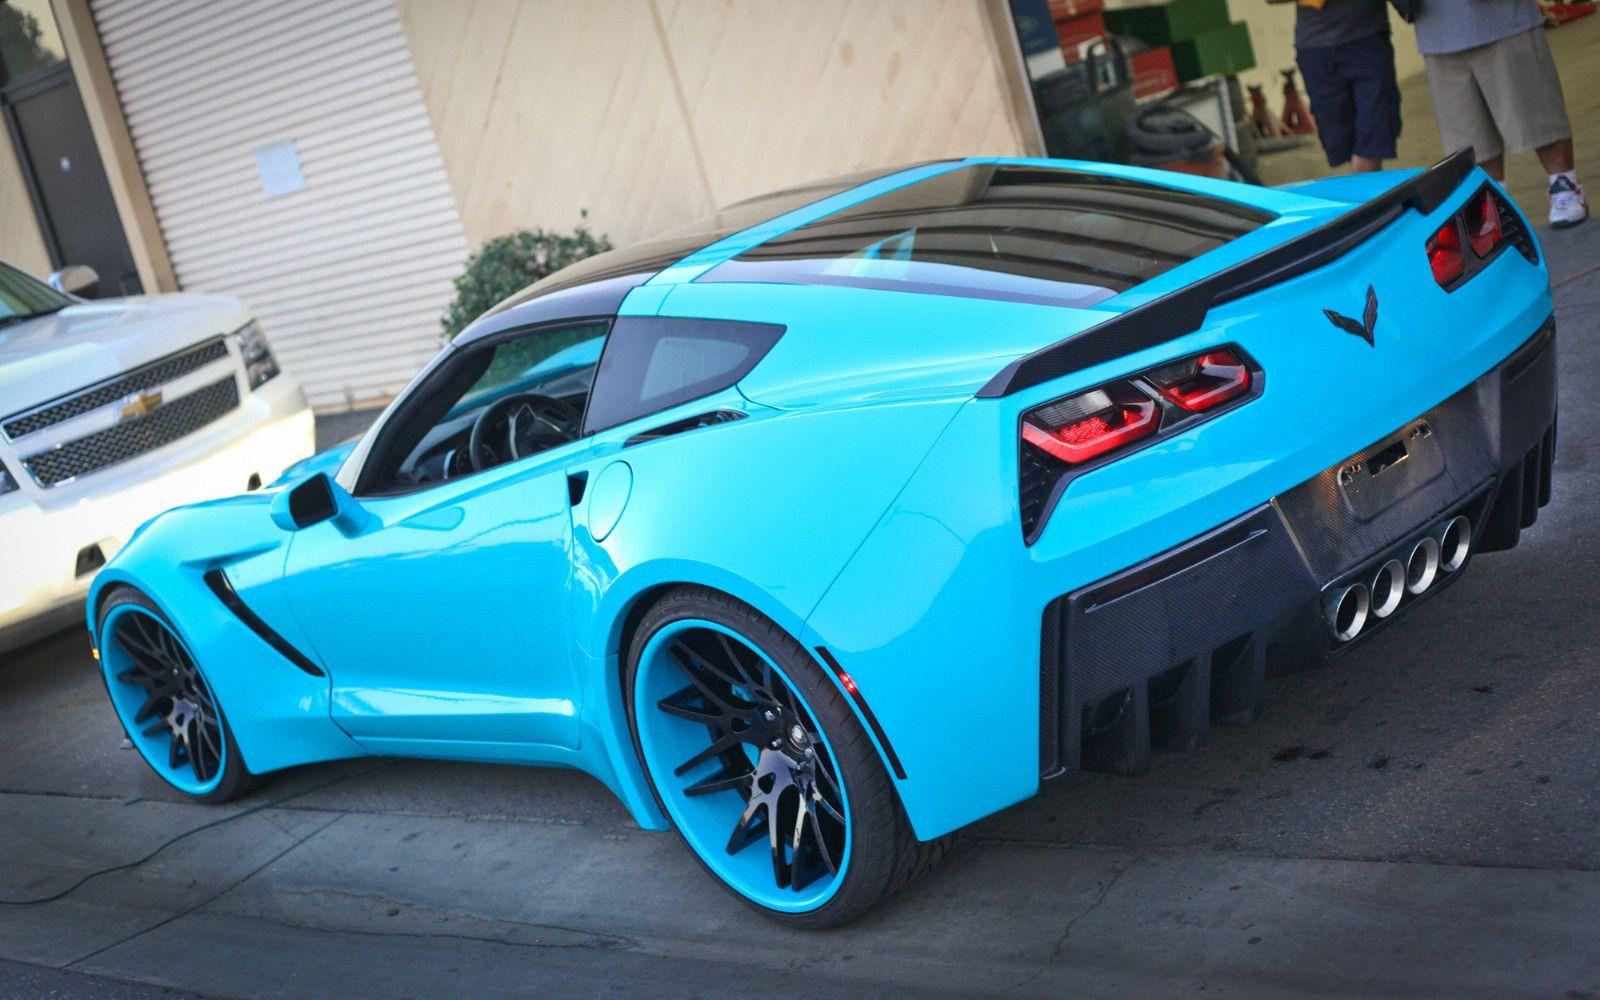 2014 Chevrolet Corvette Stingray Wide Body by New